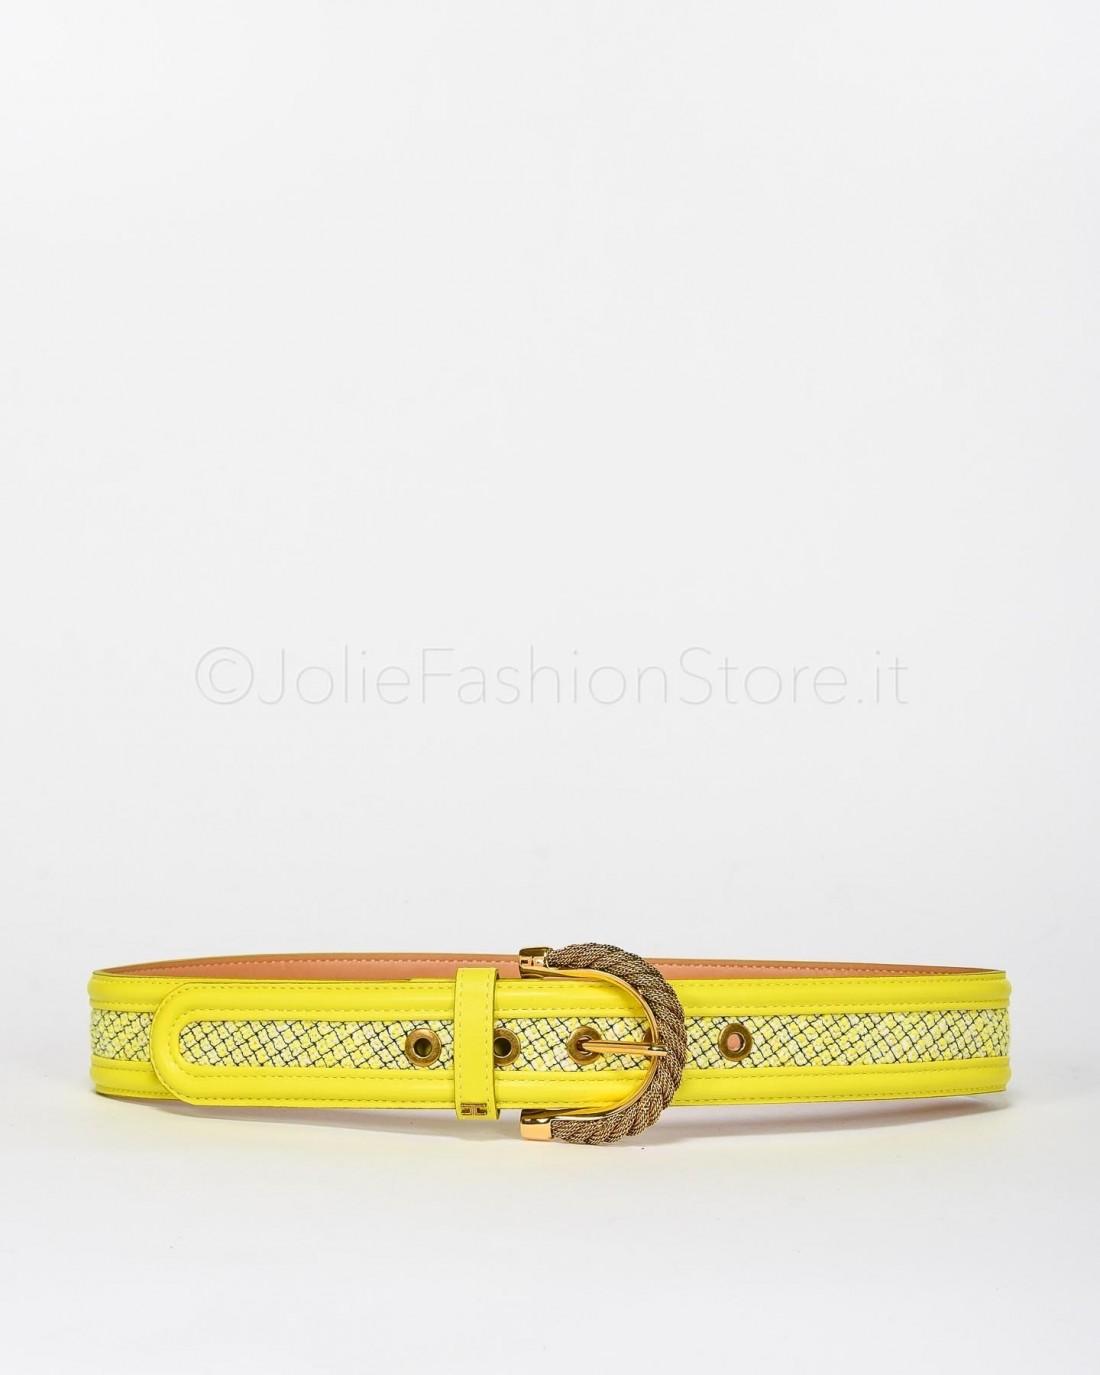 Elisabetta Franchi Cintura Gialla in Tessuto con Fibbia  CT25S03E2-Y39